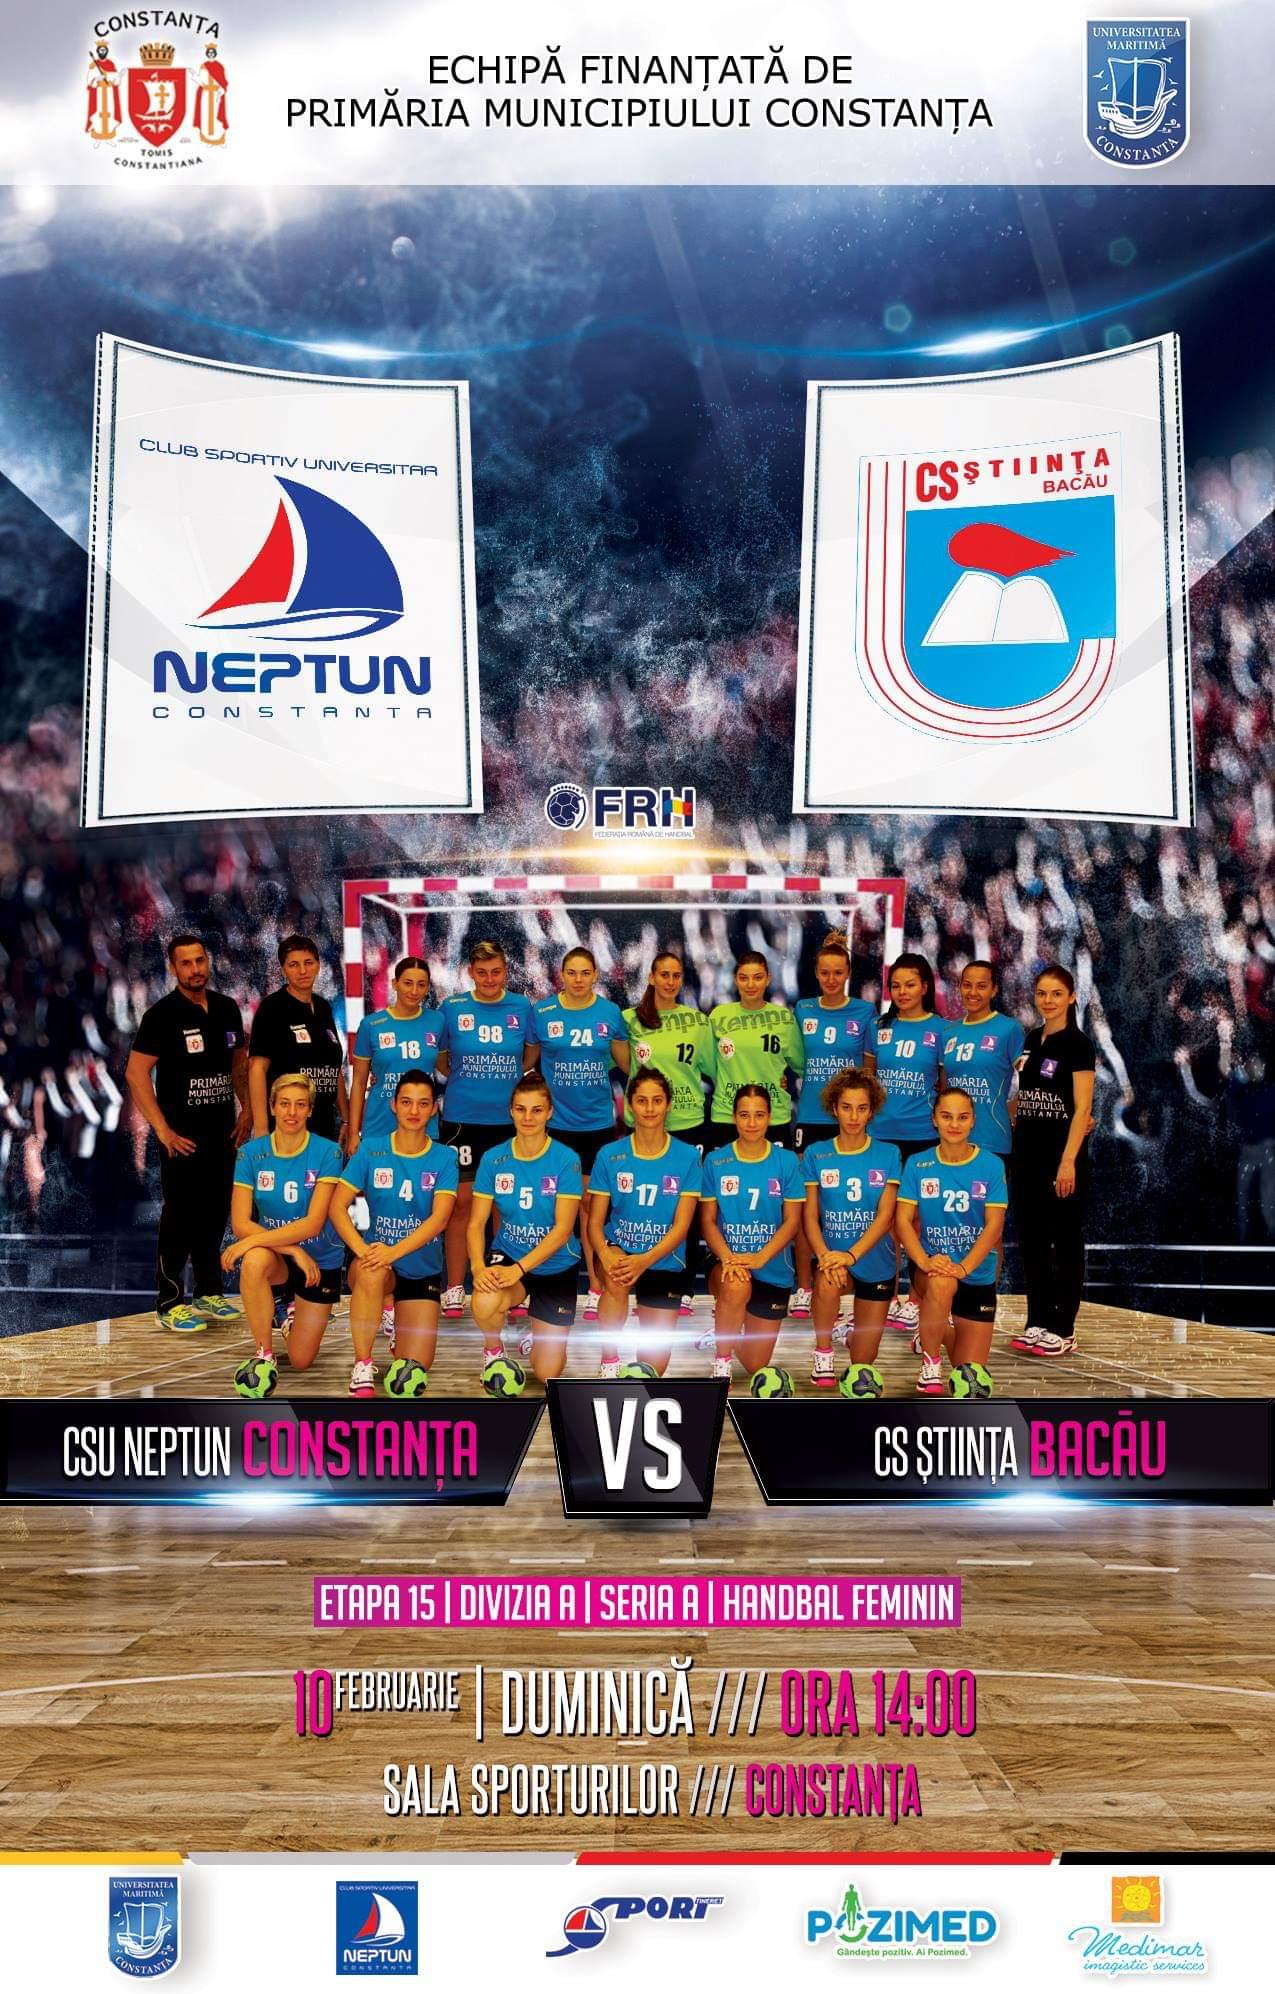 afis CSU Neptun Constanta vs. CS Stiinta Bacau 10.02.2019